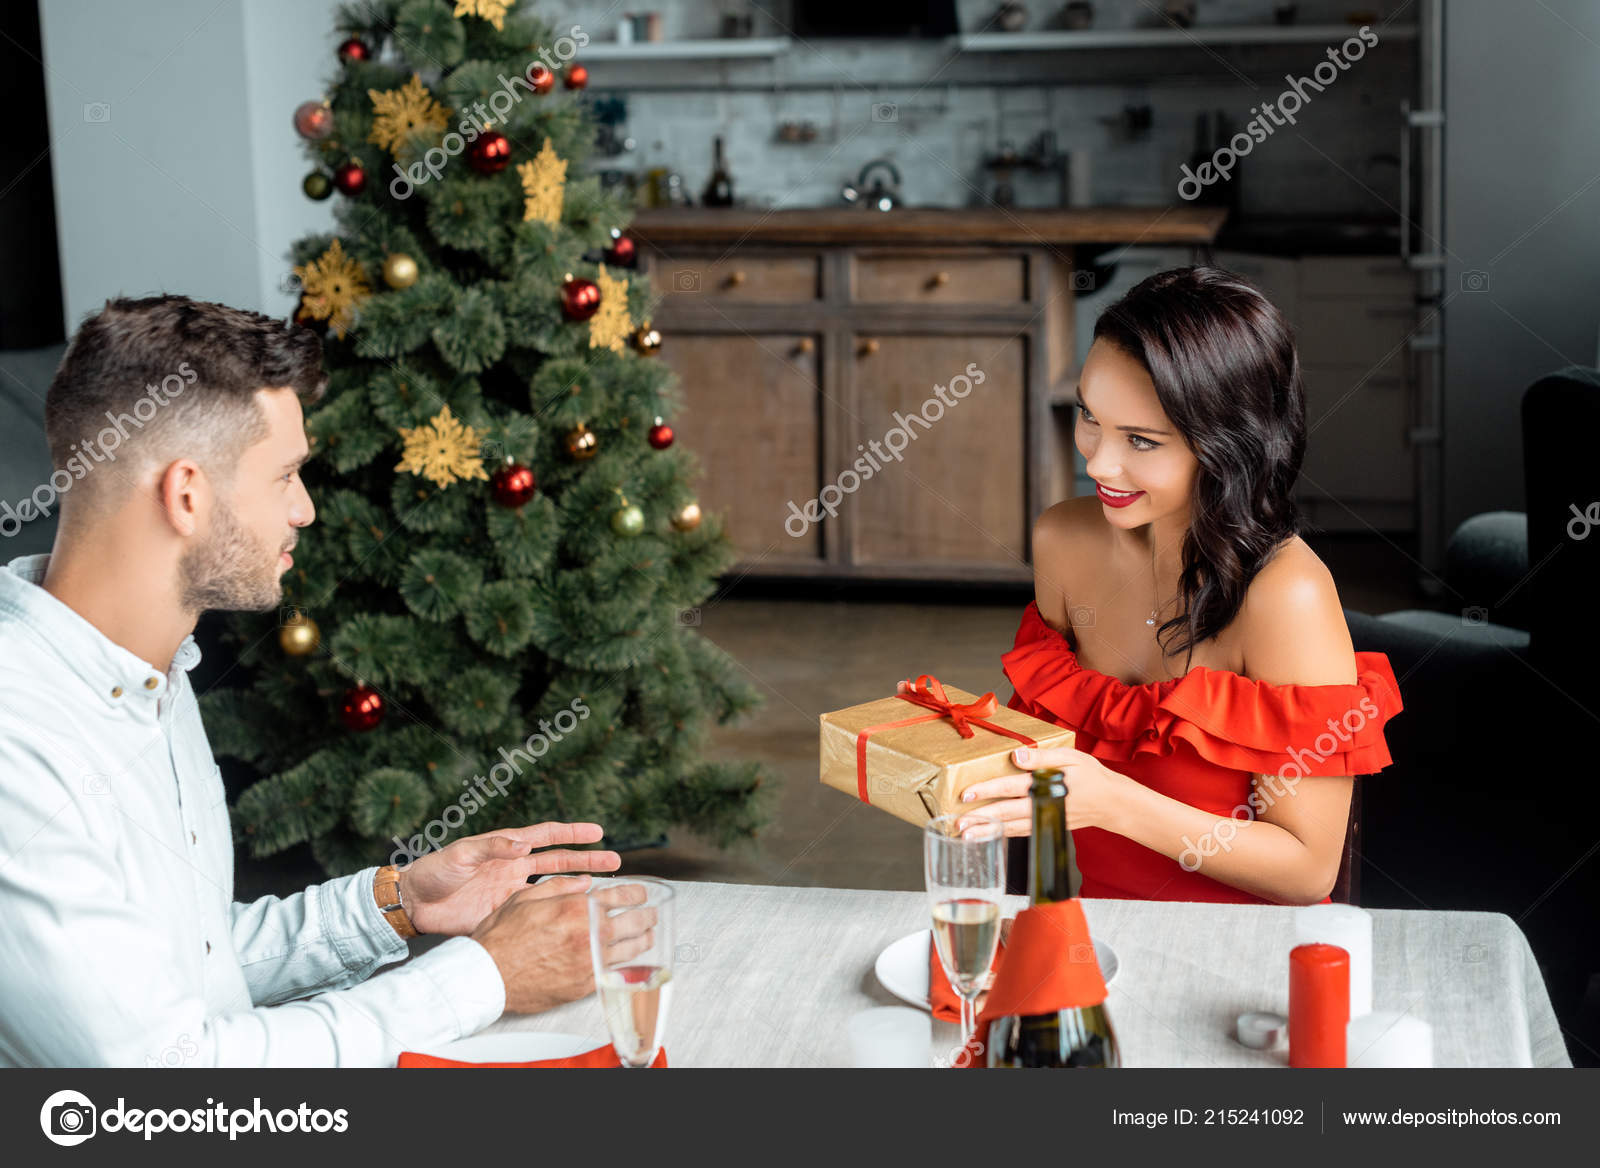 Attractive Young Woman Gifting Christmas Present Boyfriend Sitting Served Table Stock Photo C Igorvetushko 215241092